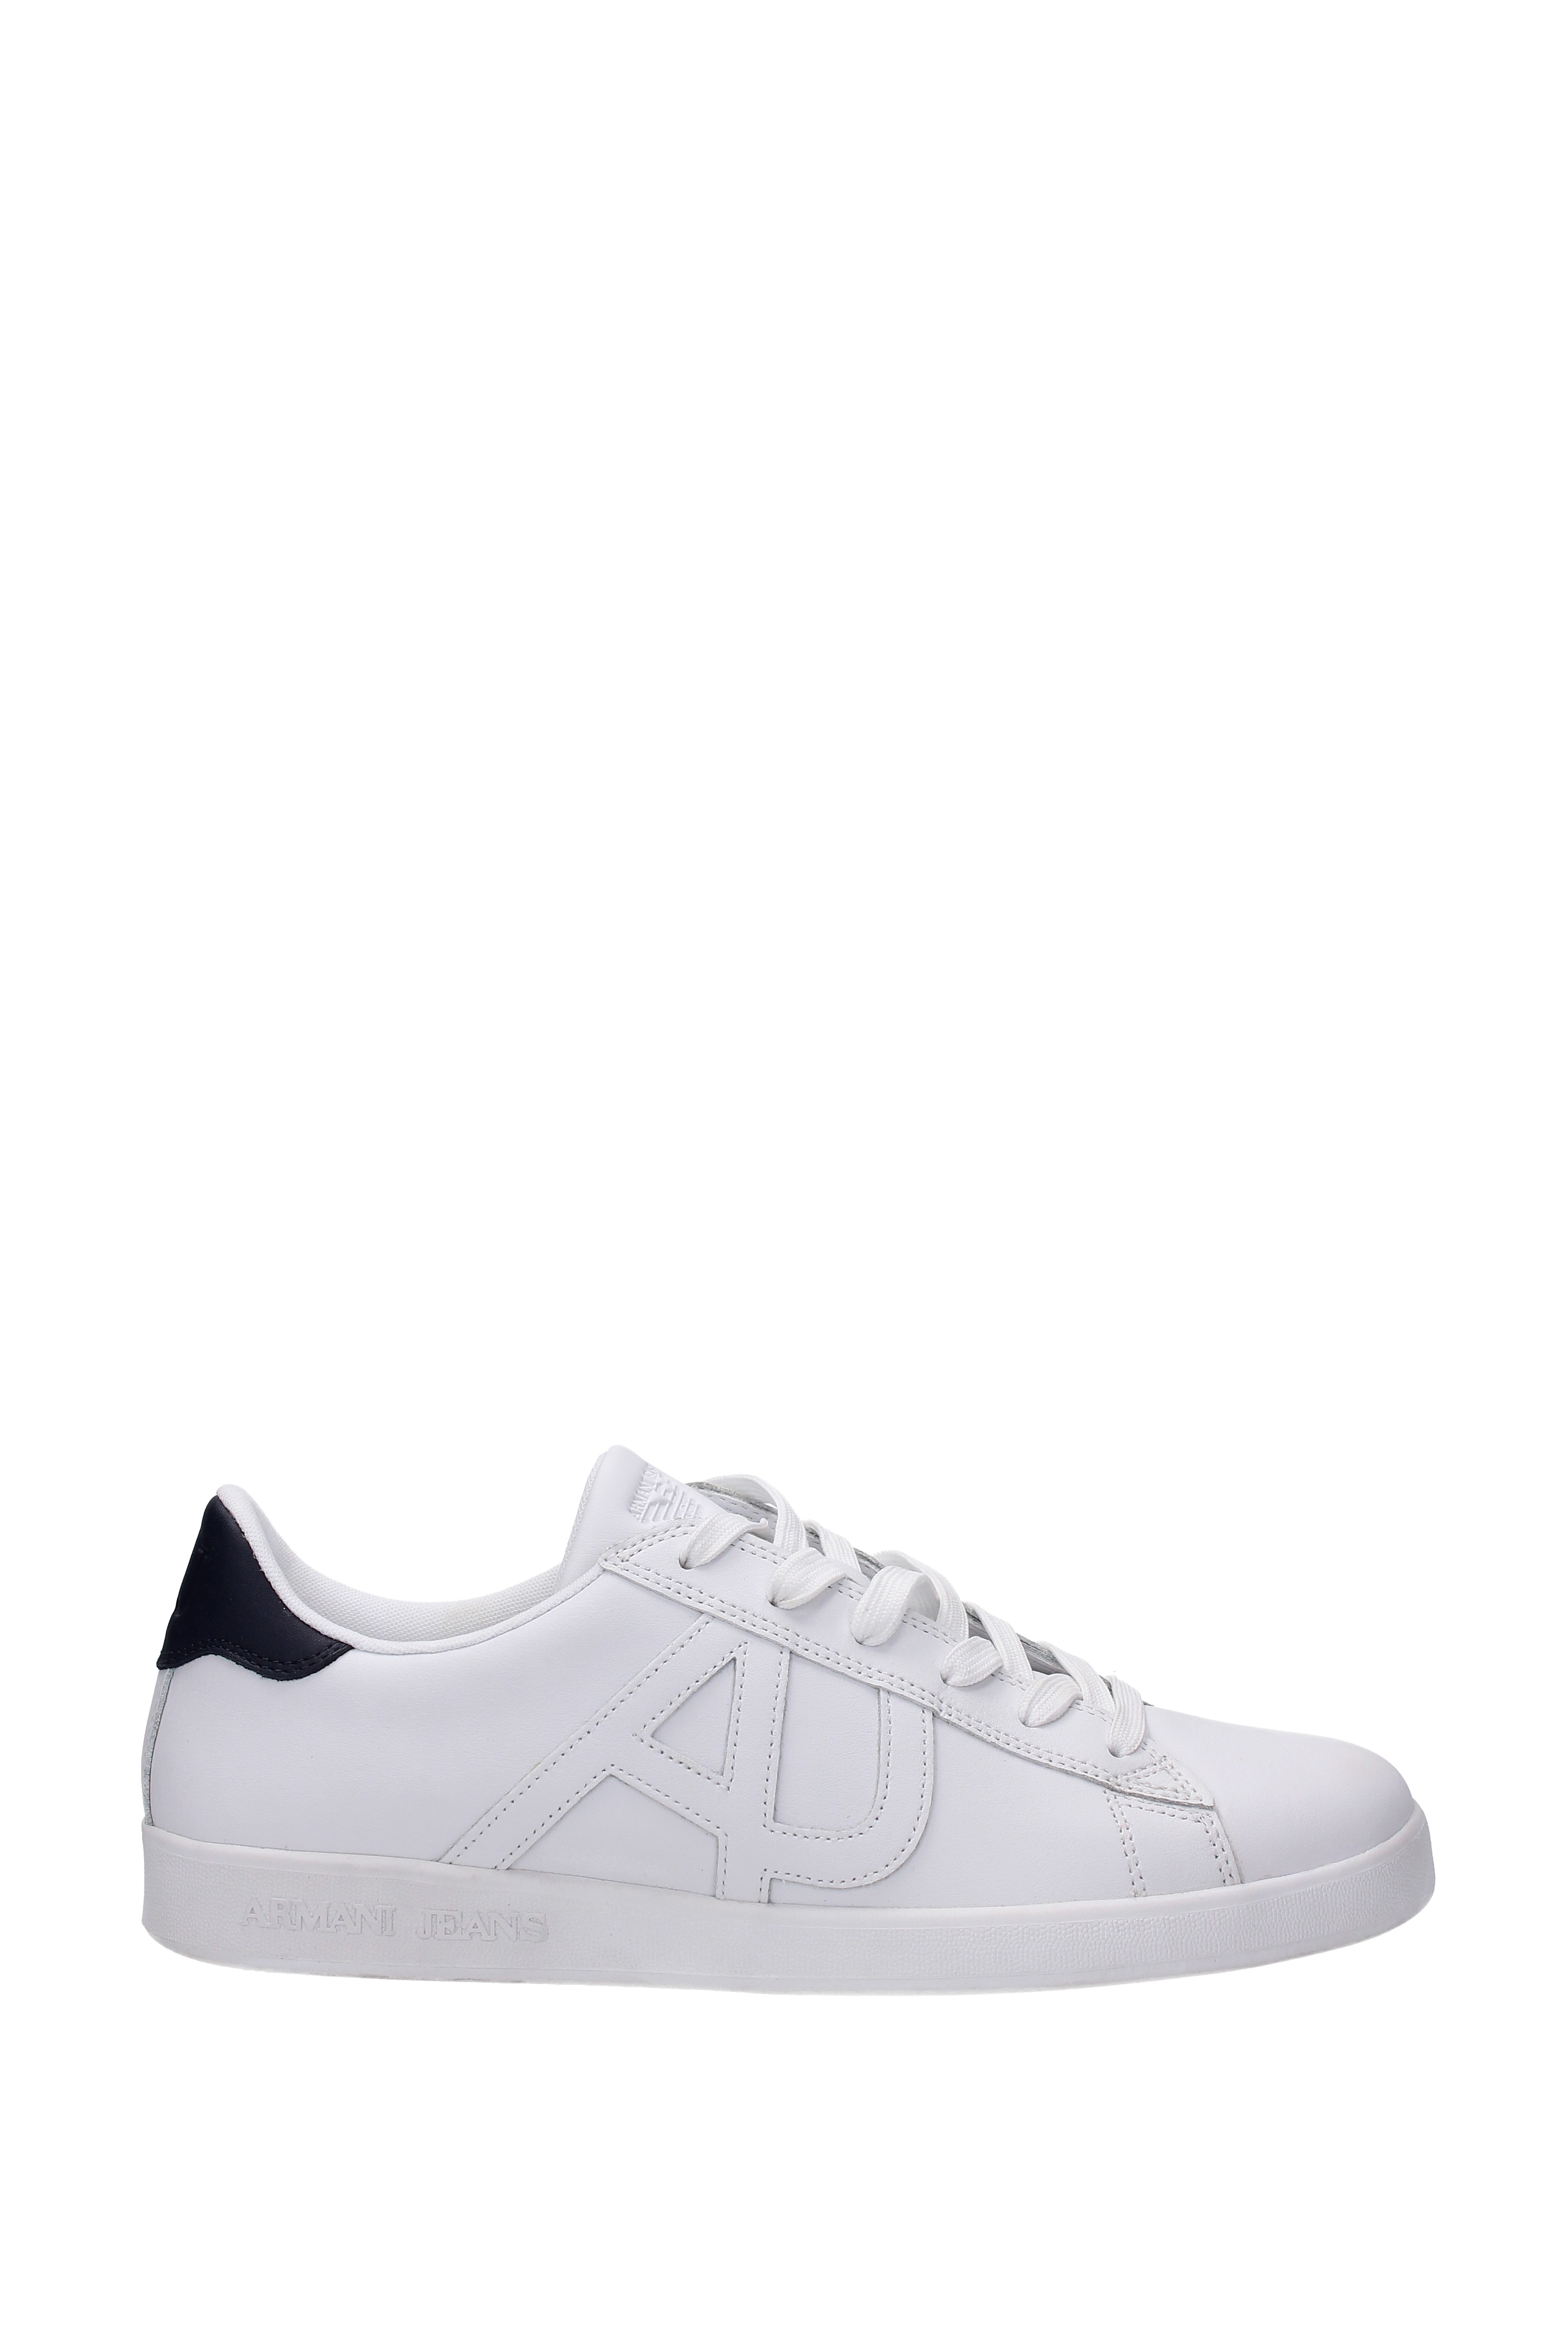 Sneakers Jeans Armani Jeans Sneakers Herren - Leder (935565CC500) 19b5e0